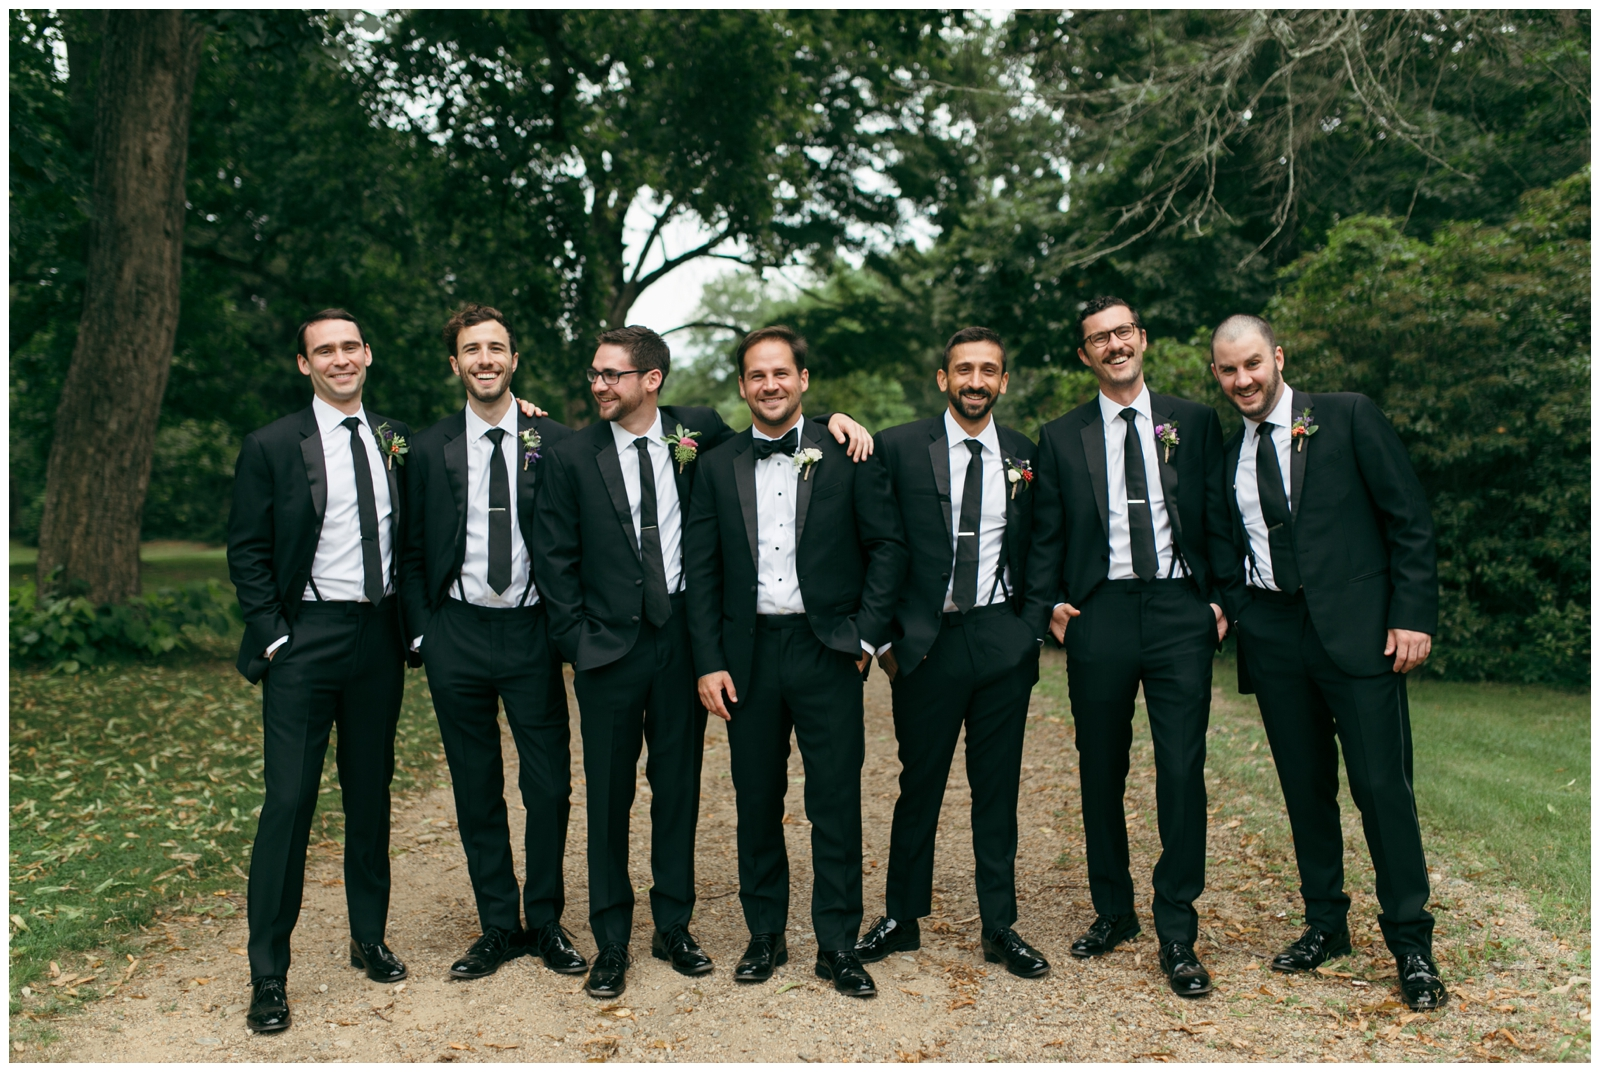 Moraine-Farm-wedding-Bailey-Q-Photo-Massachusetts-wedding-photpgrapher-039.jpg